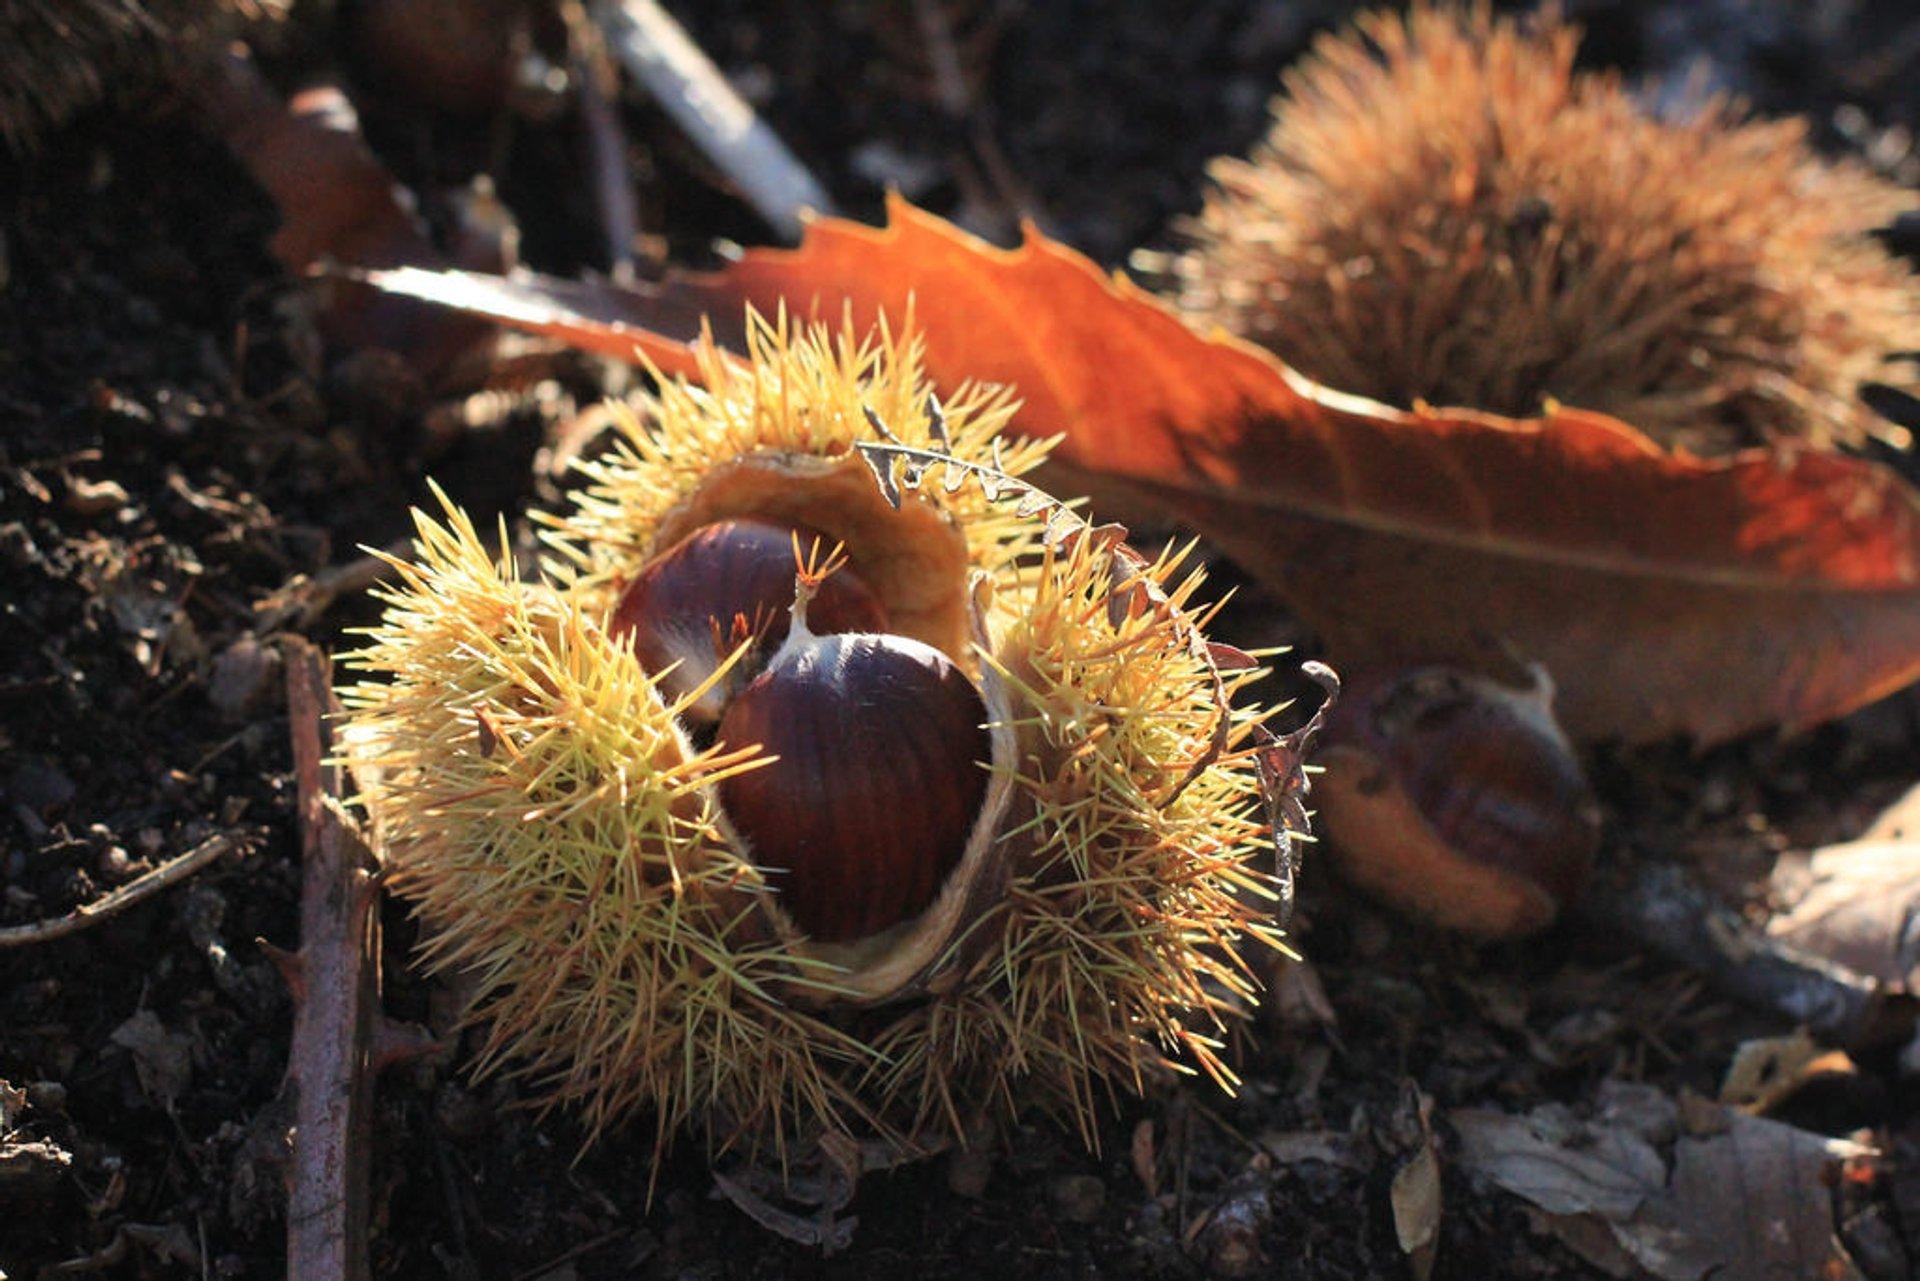 Chestnut Season in Corsica 2019 - Best Time